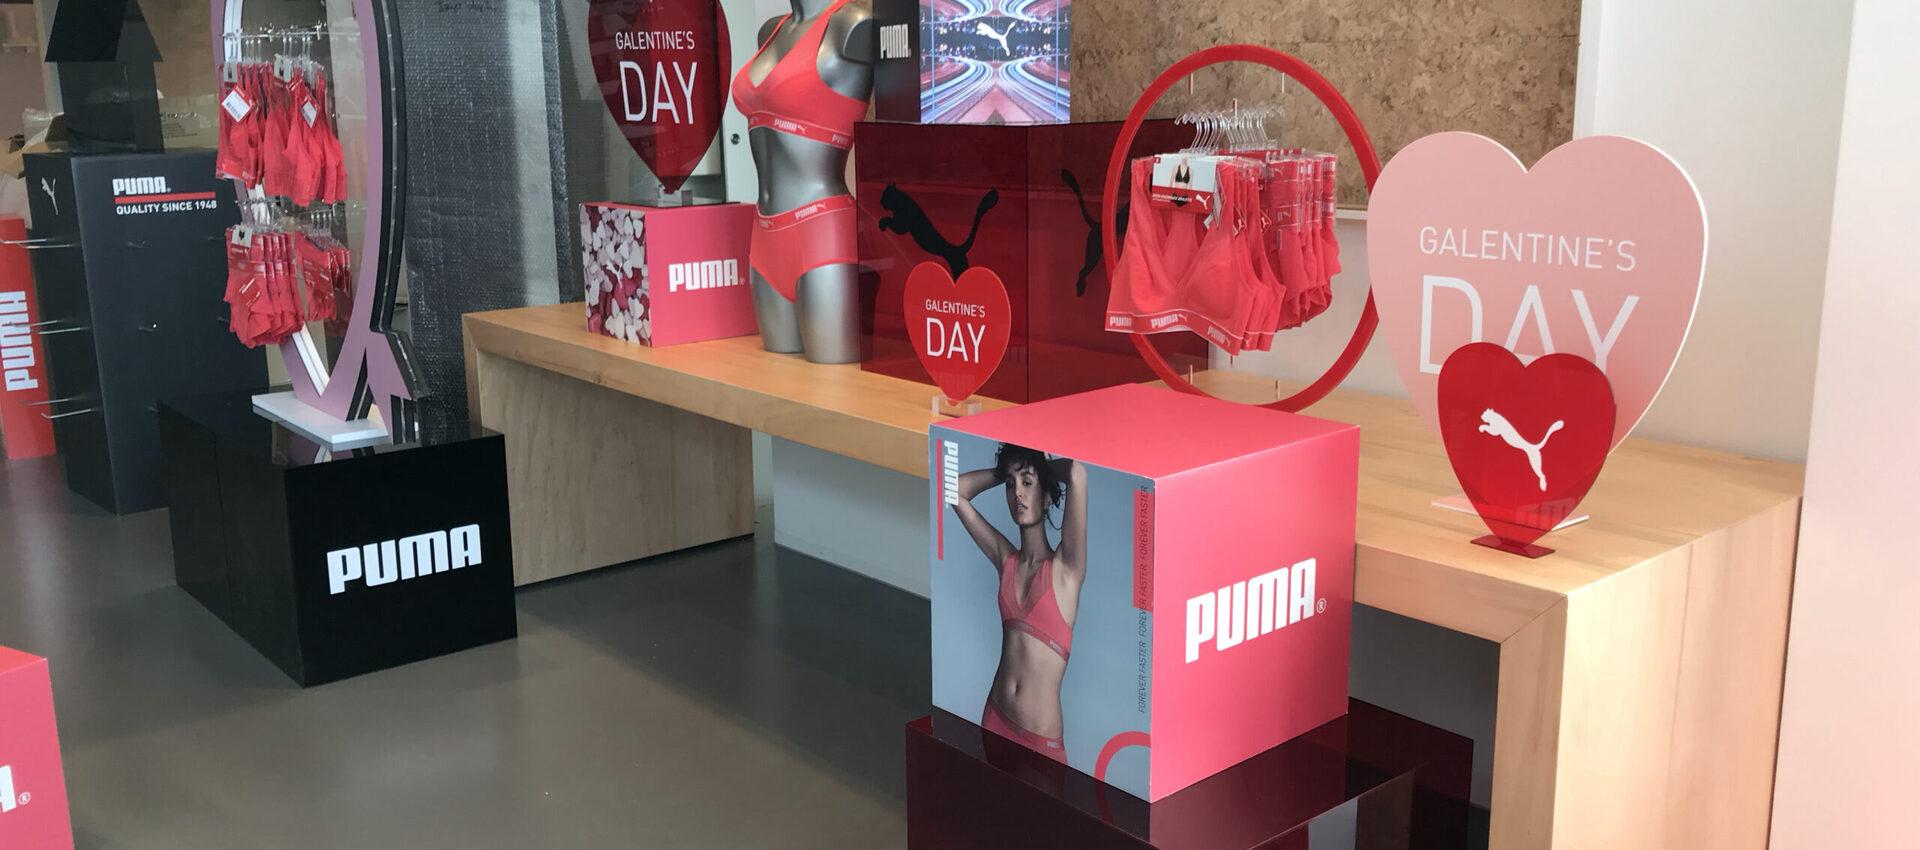 Puma displays